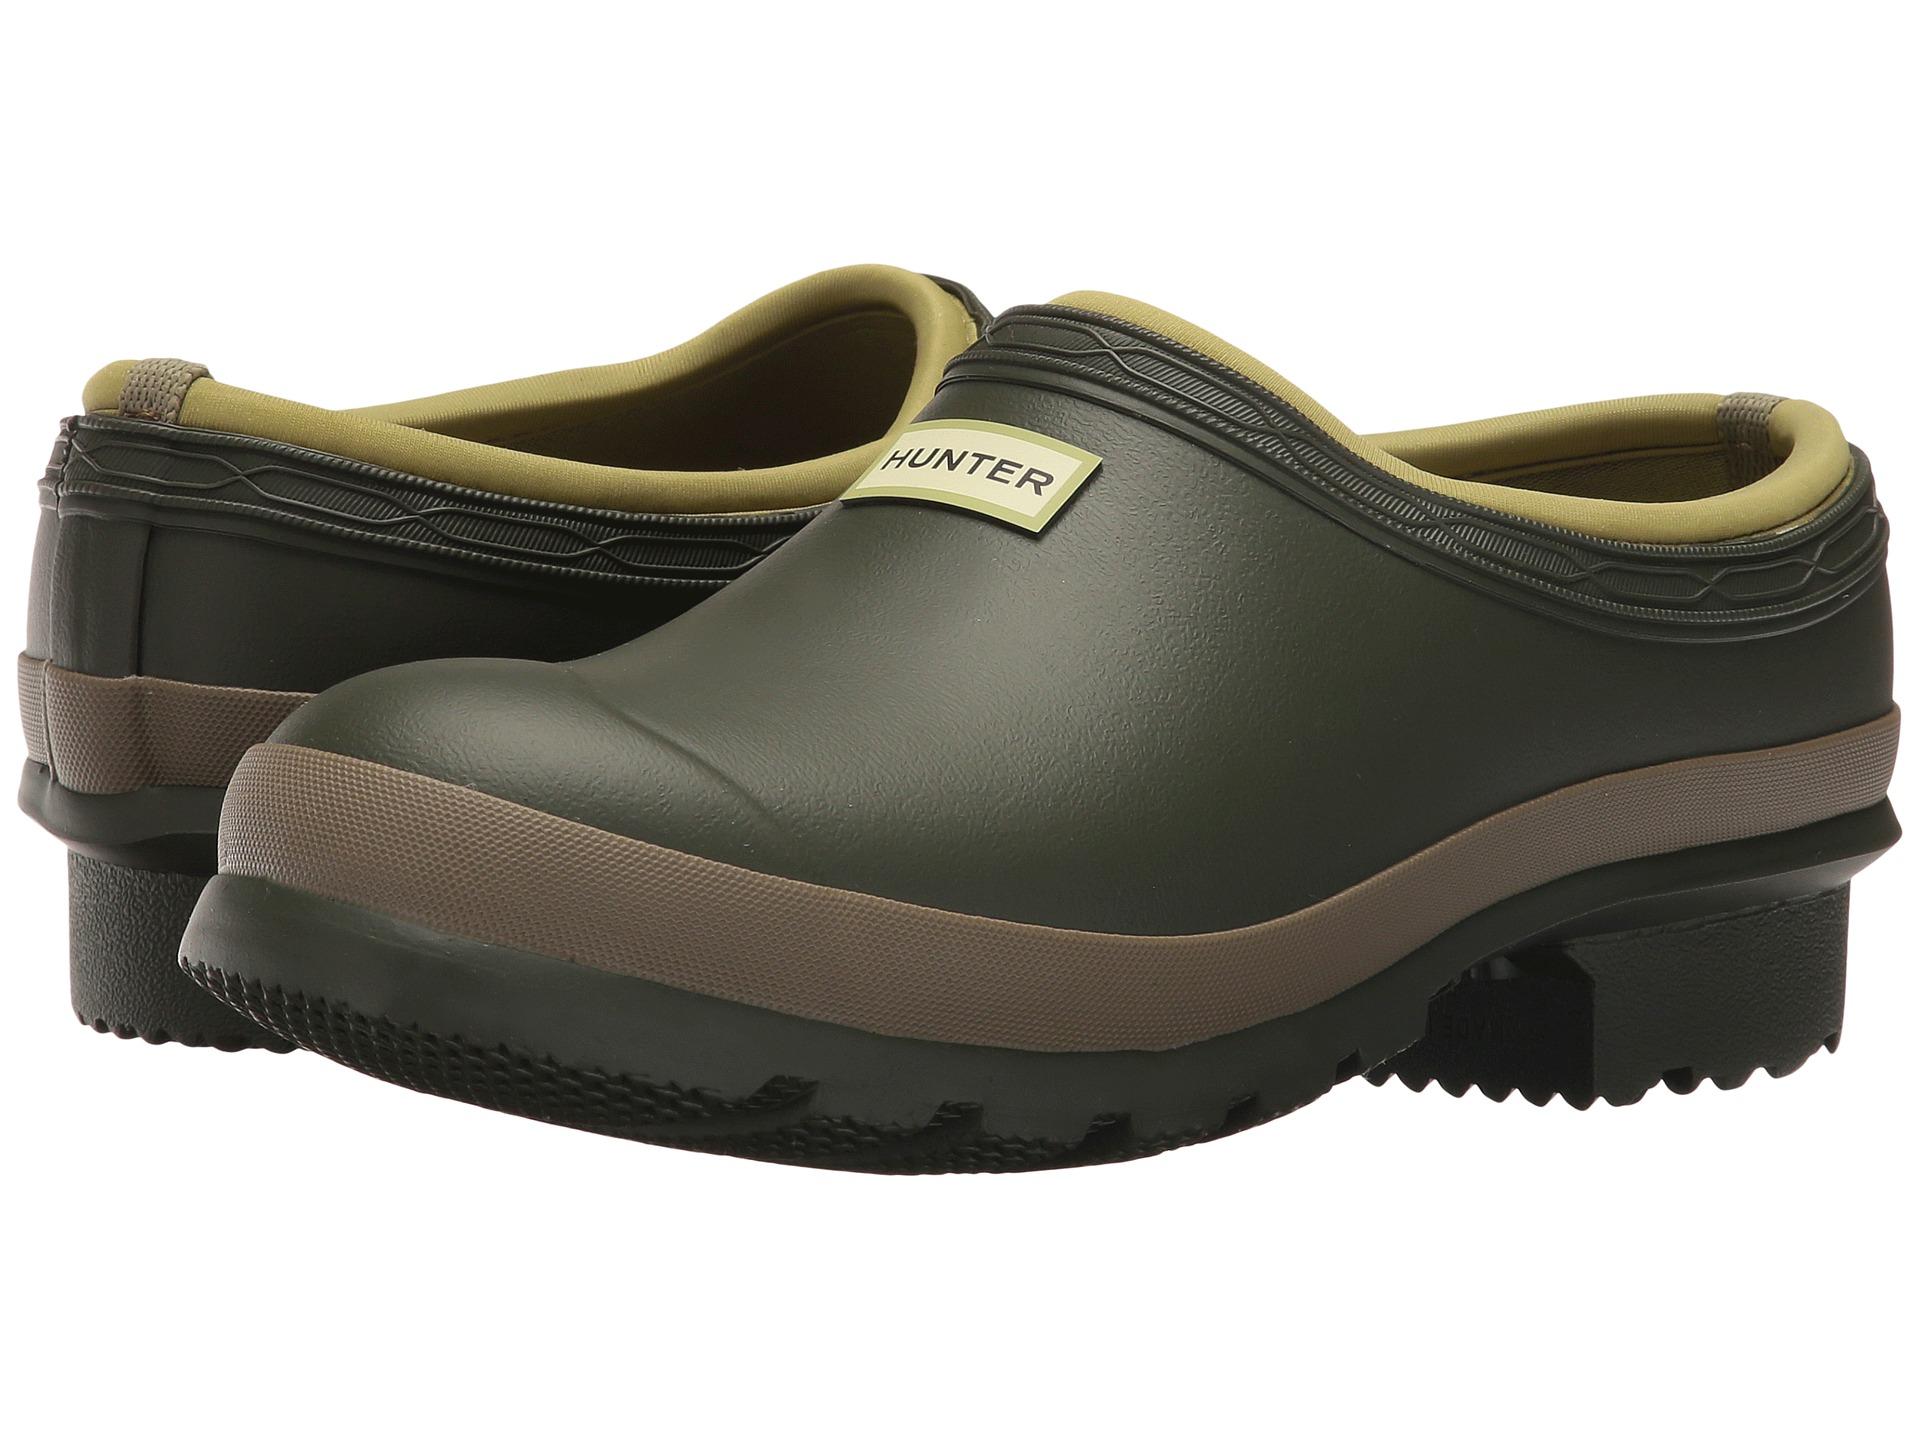 Garden Clogs Ebay Garden Shoes Gardening Shoes Hunter